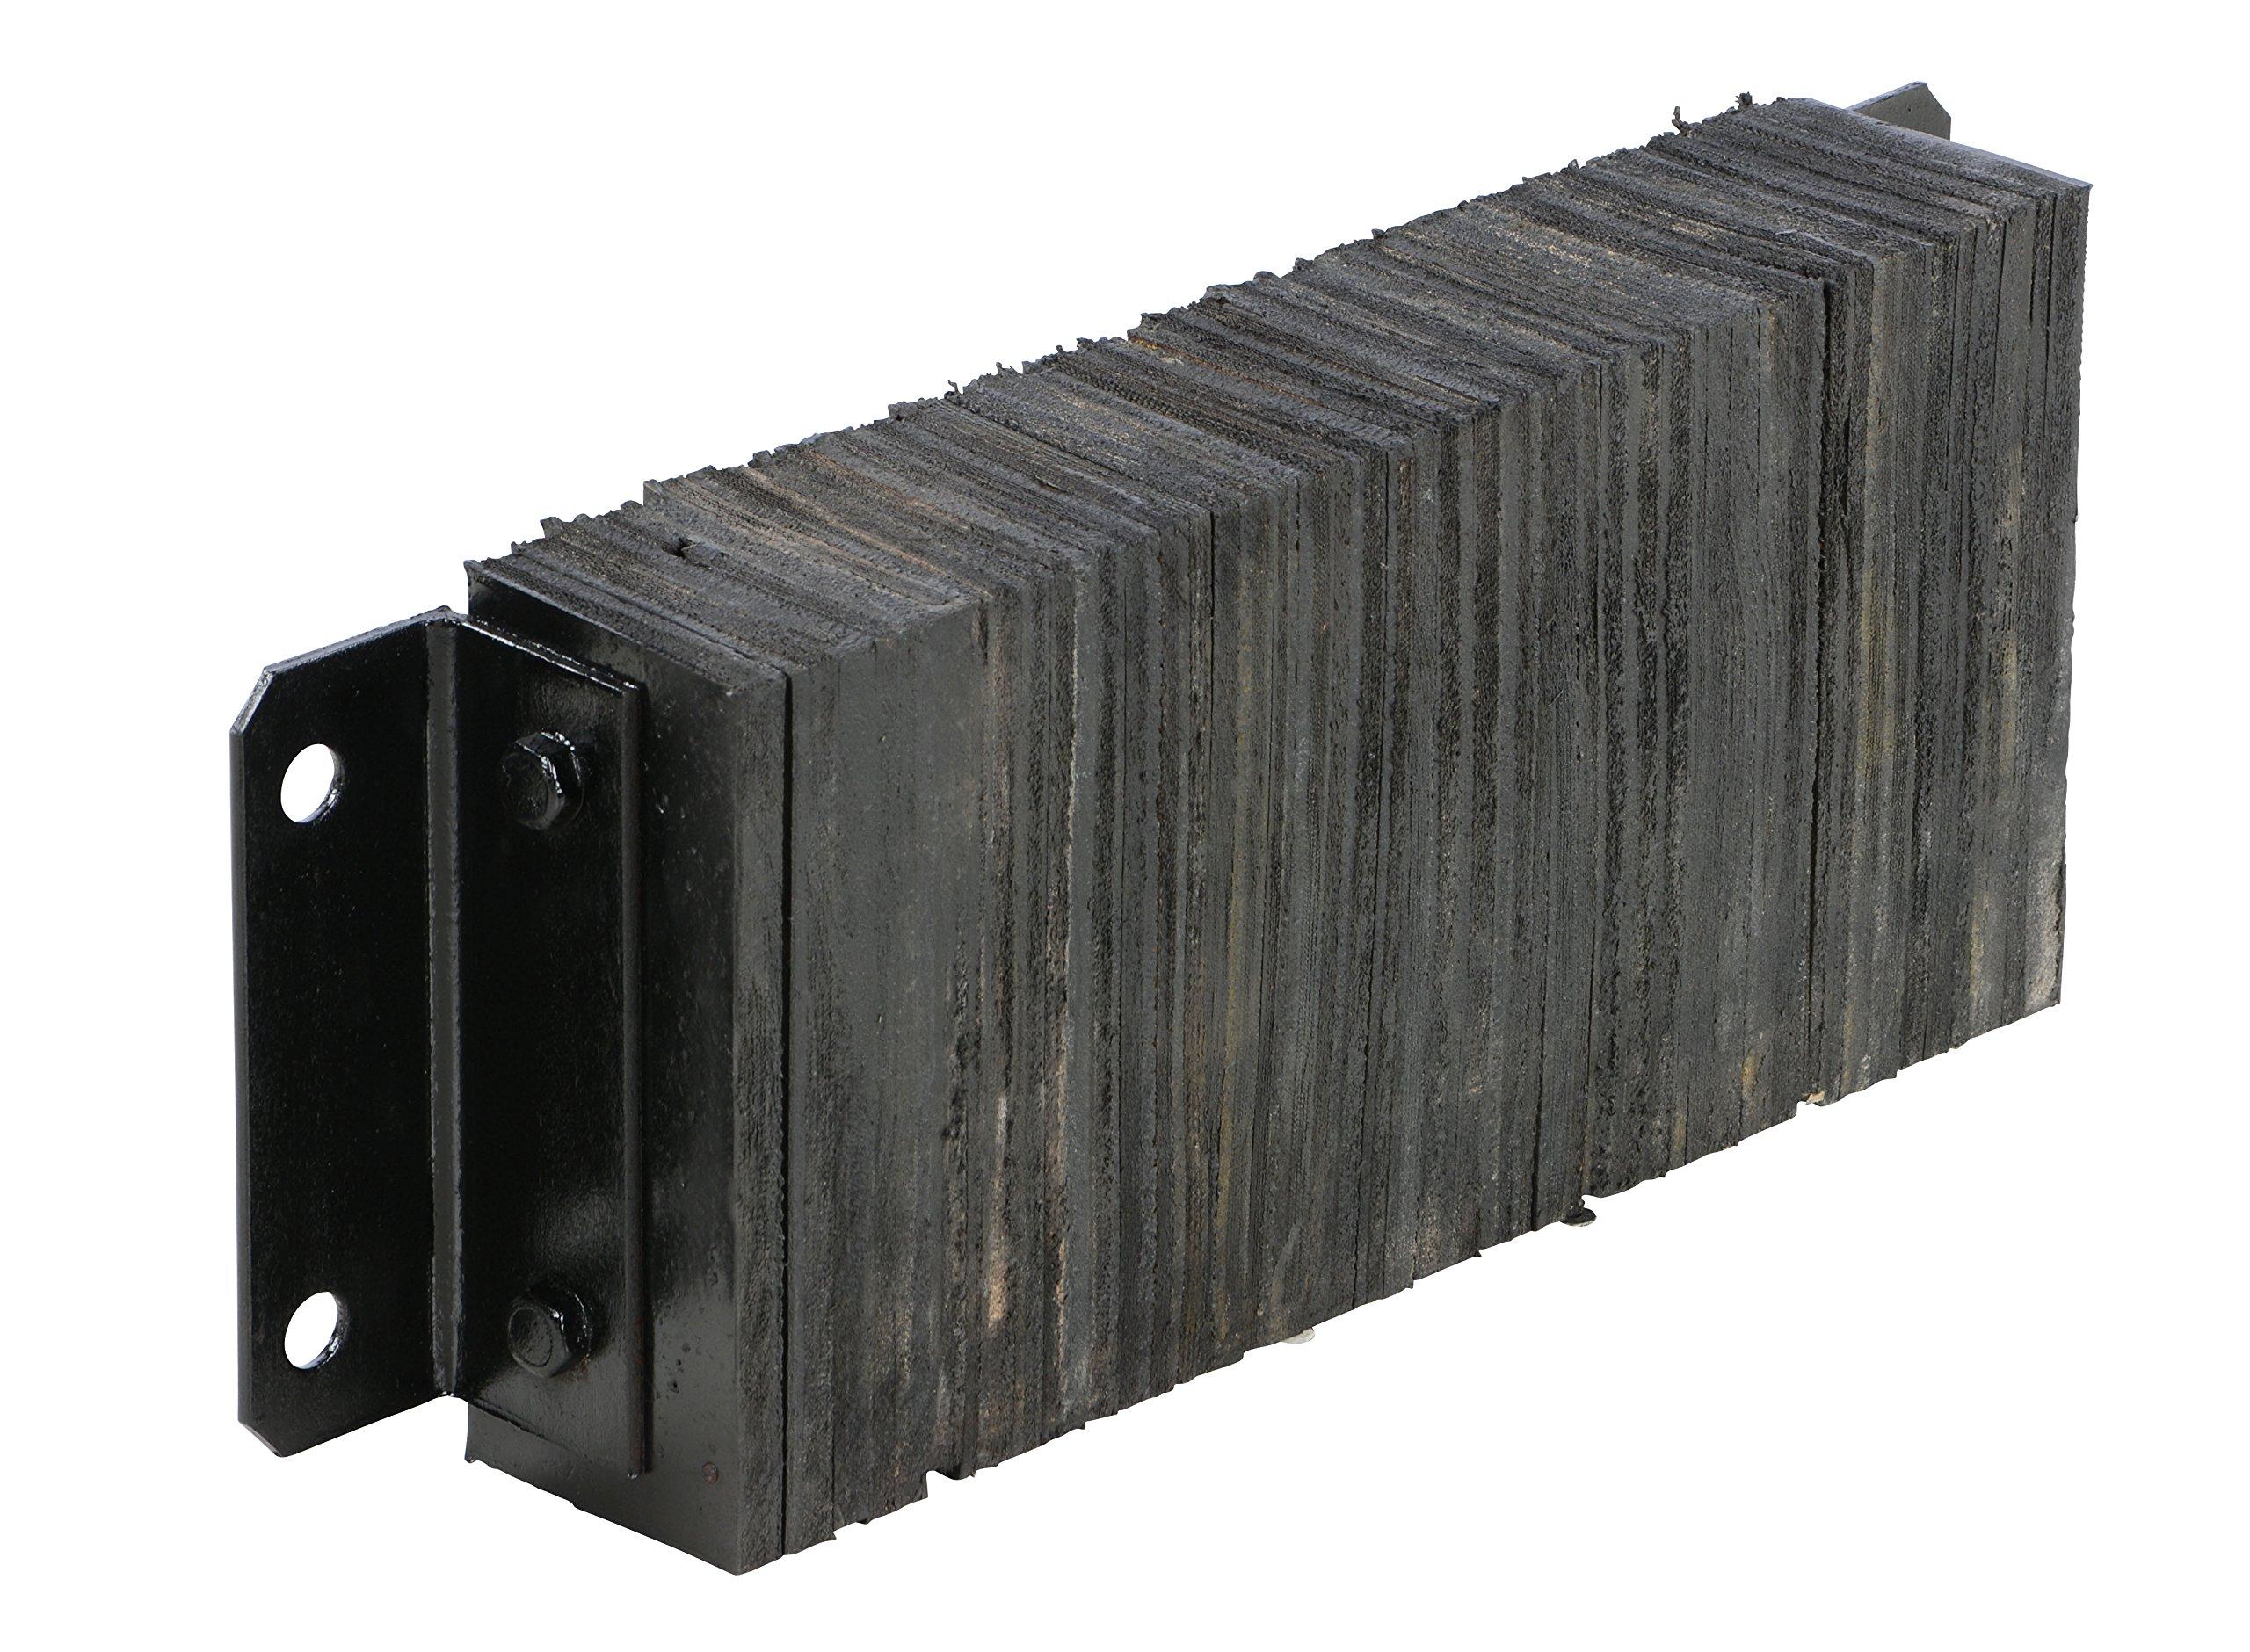 Vestil 1024-4.5 Horizontal Laminated Dock Bumper, Fabric Reinforced Rubber, Rectangular, 4 Holes, 10'' Height, 24'' Width, 4-1/2'' Depth